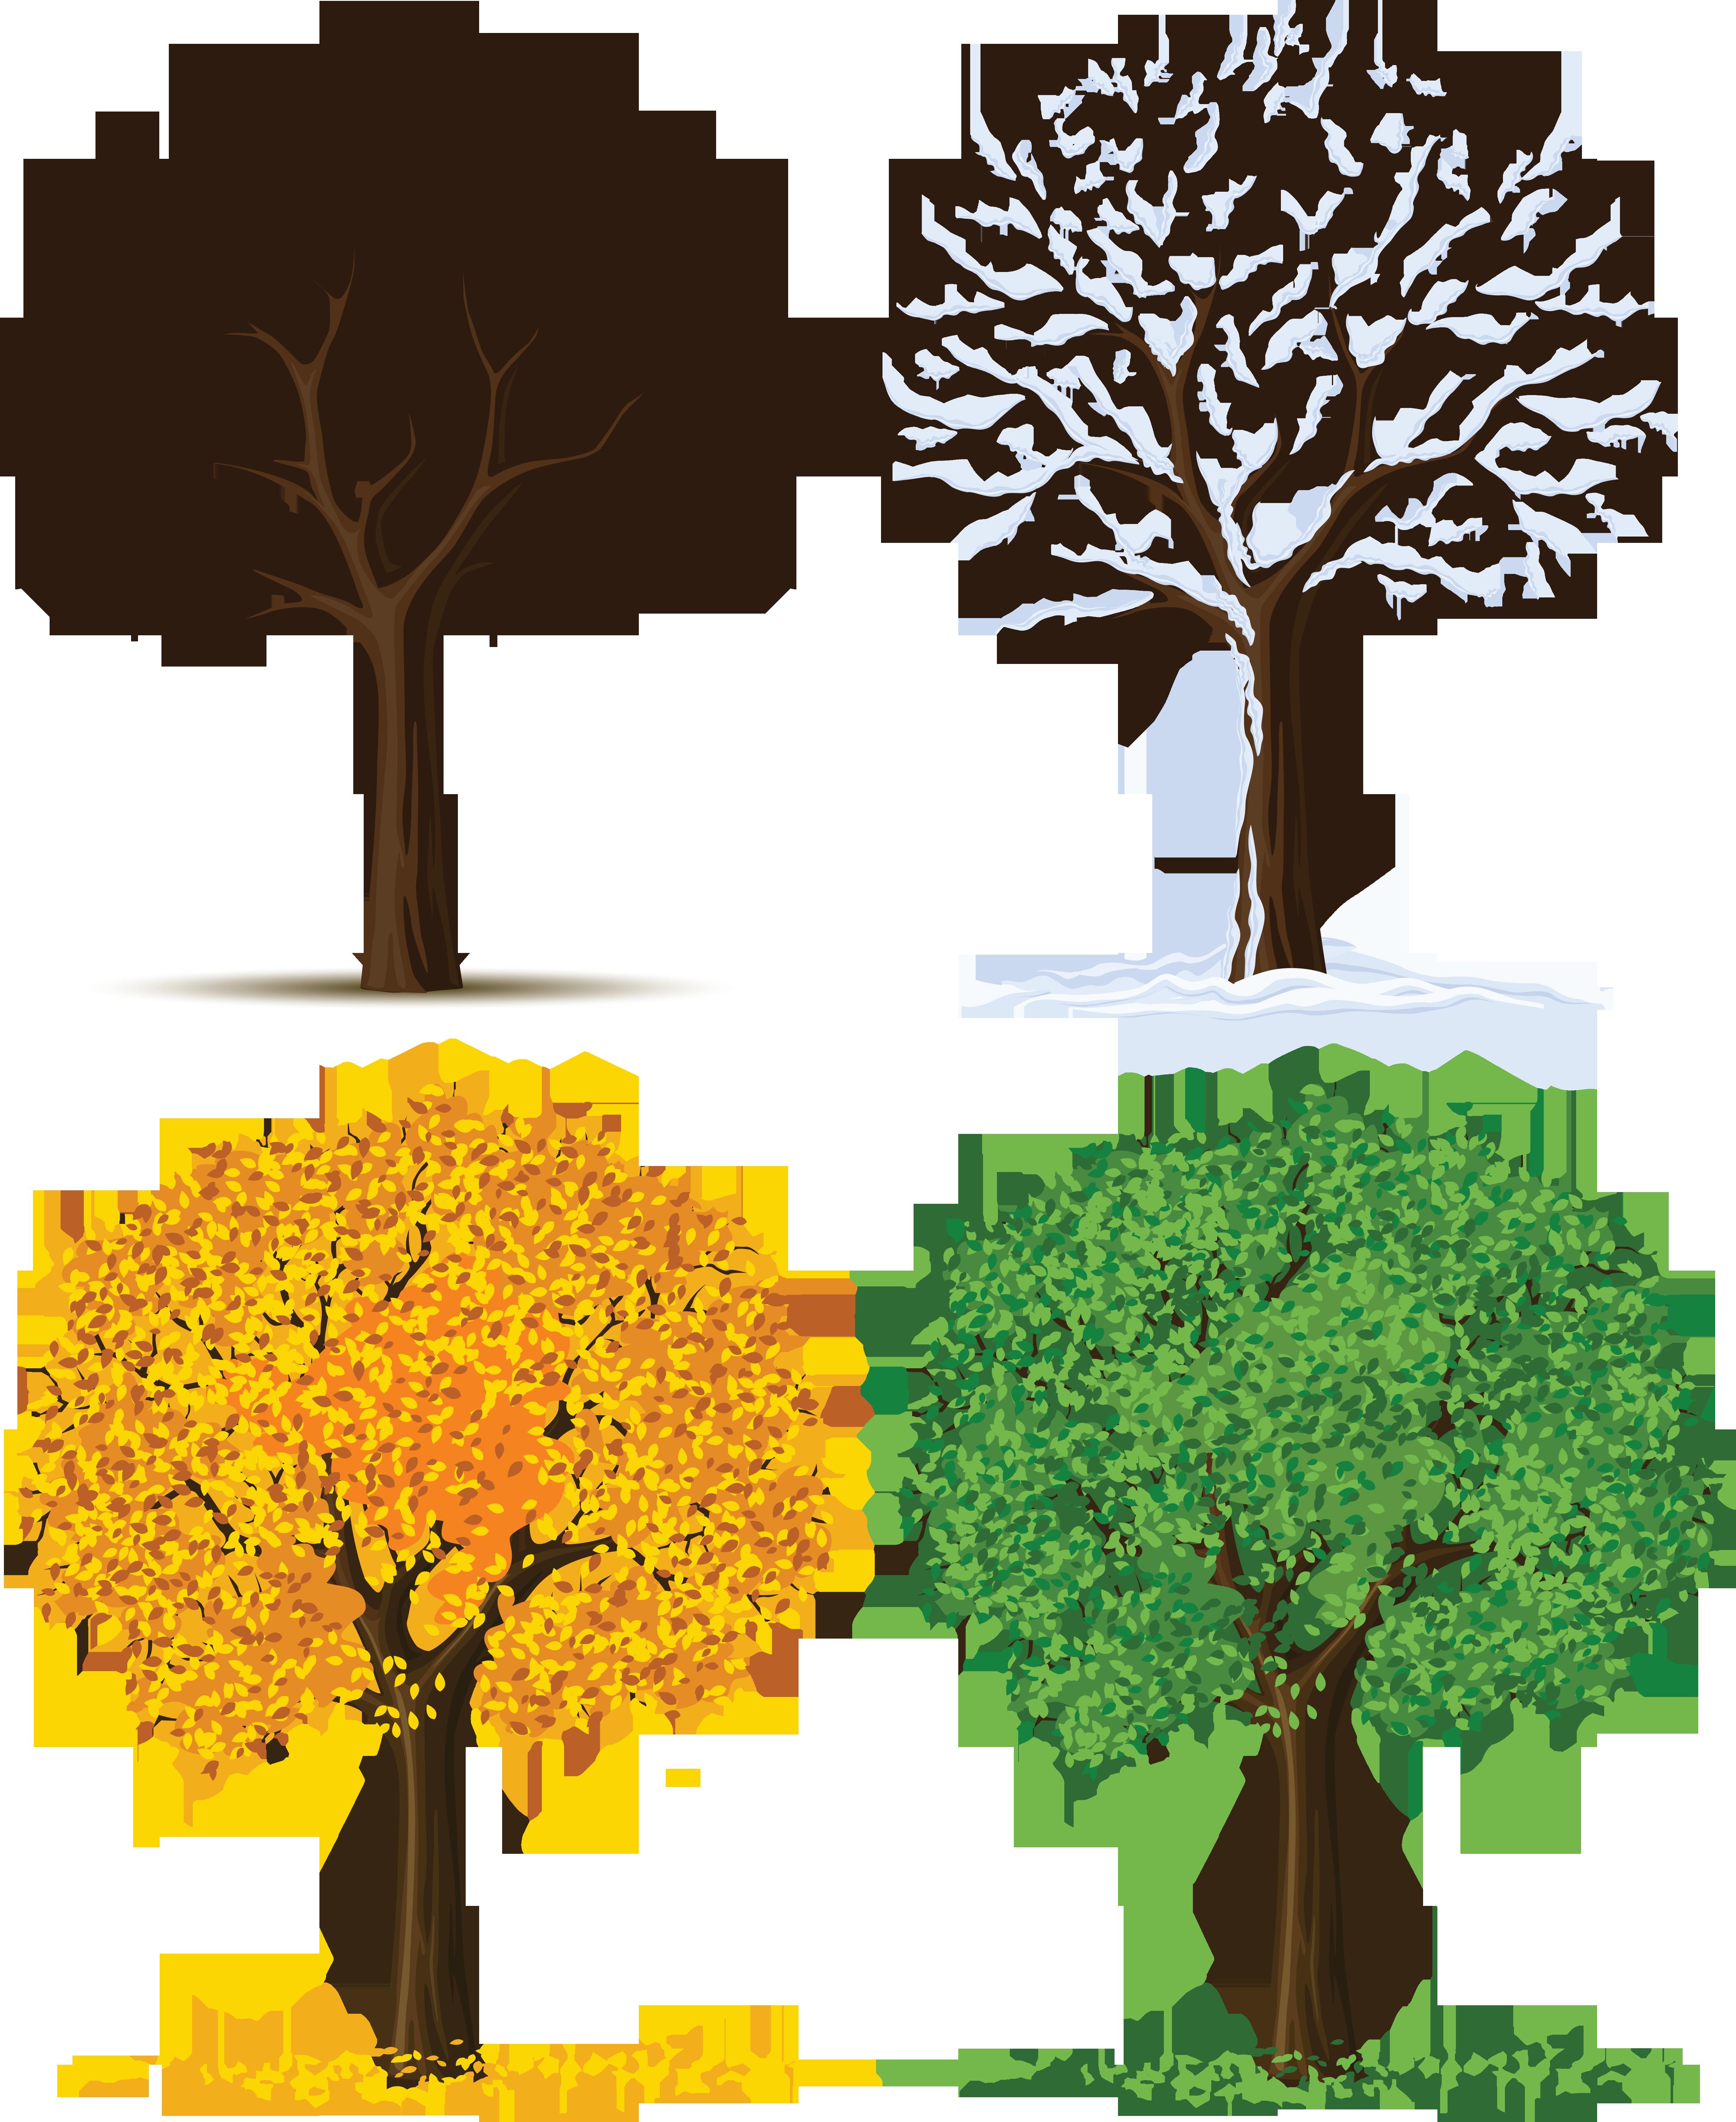 Four seasons tree clipart free clip art free library Tree with seasons clipart - ClipartFest clip art free library